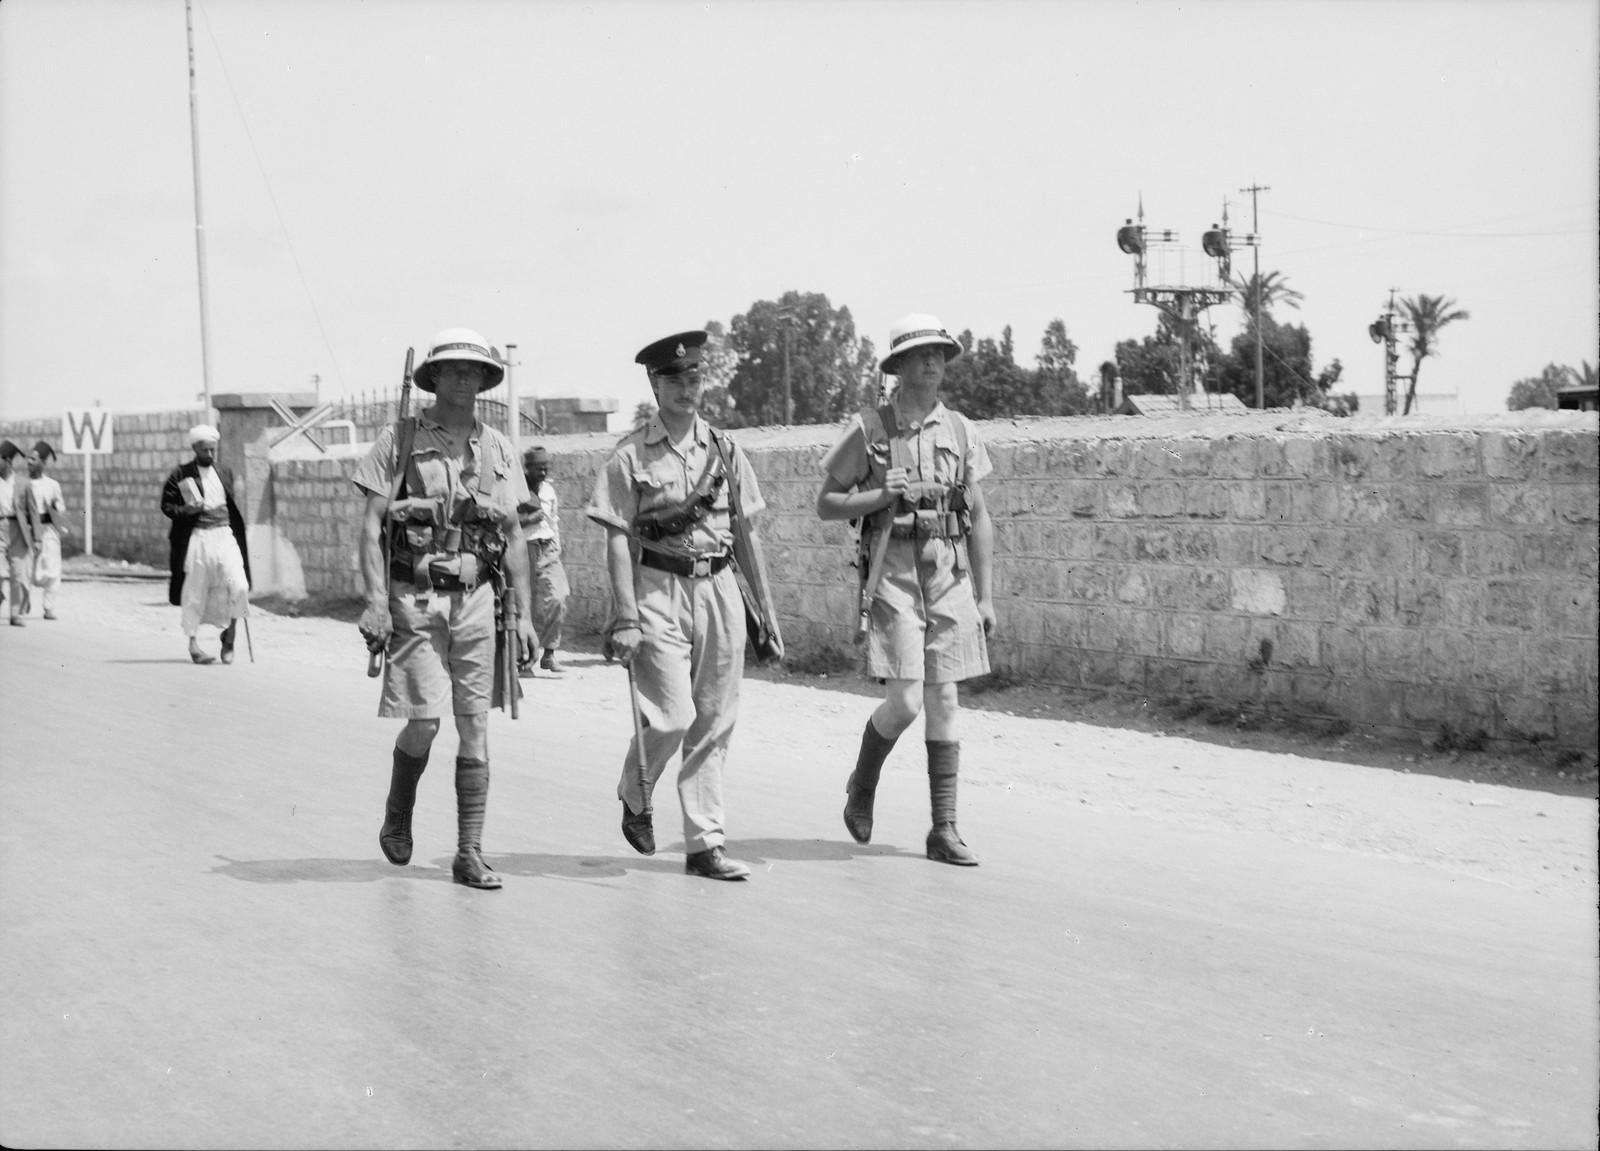 10. 1938. Два морских пехотинца вместе с полицейским патрулируют Назарет-стрит в Хаифе